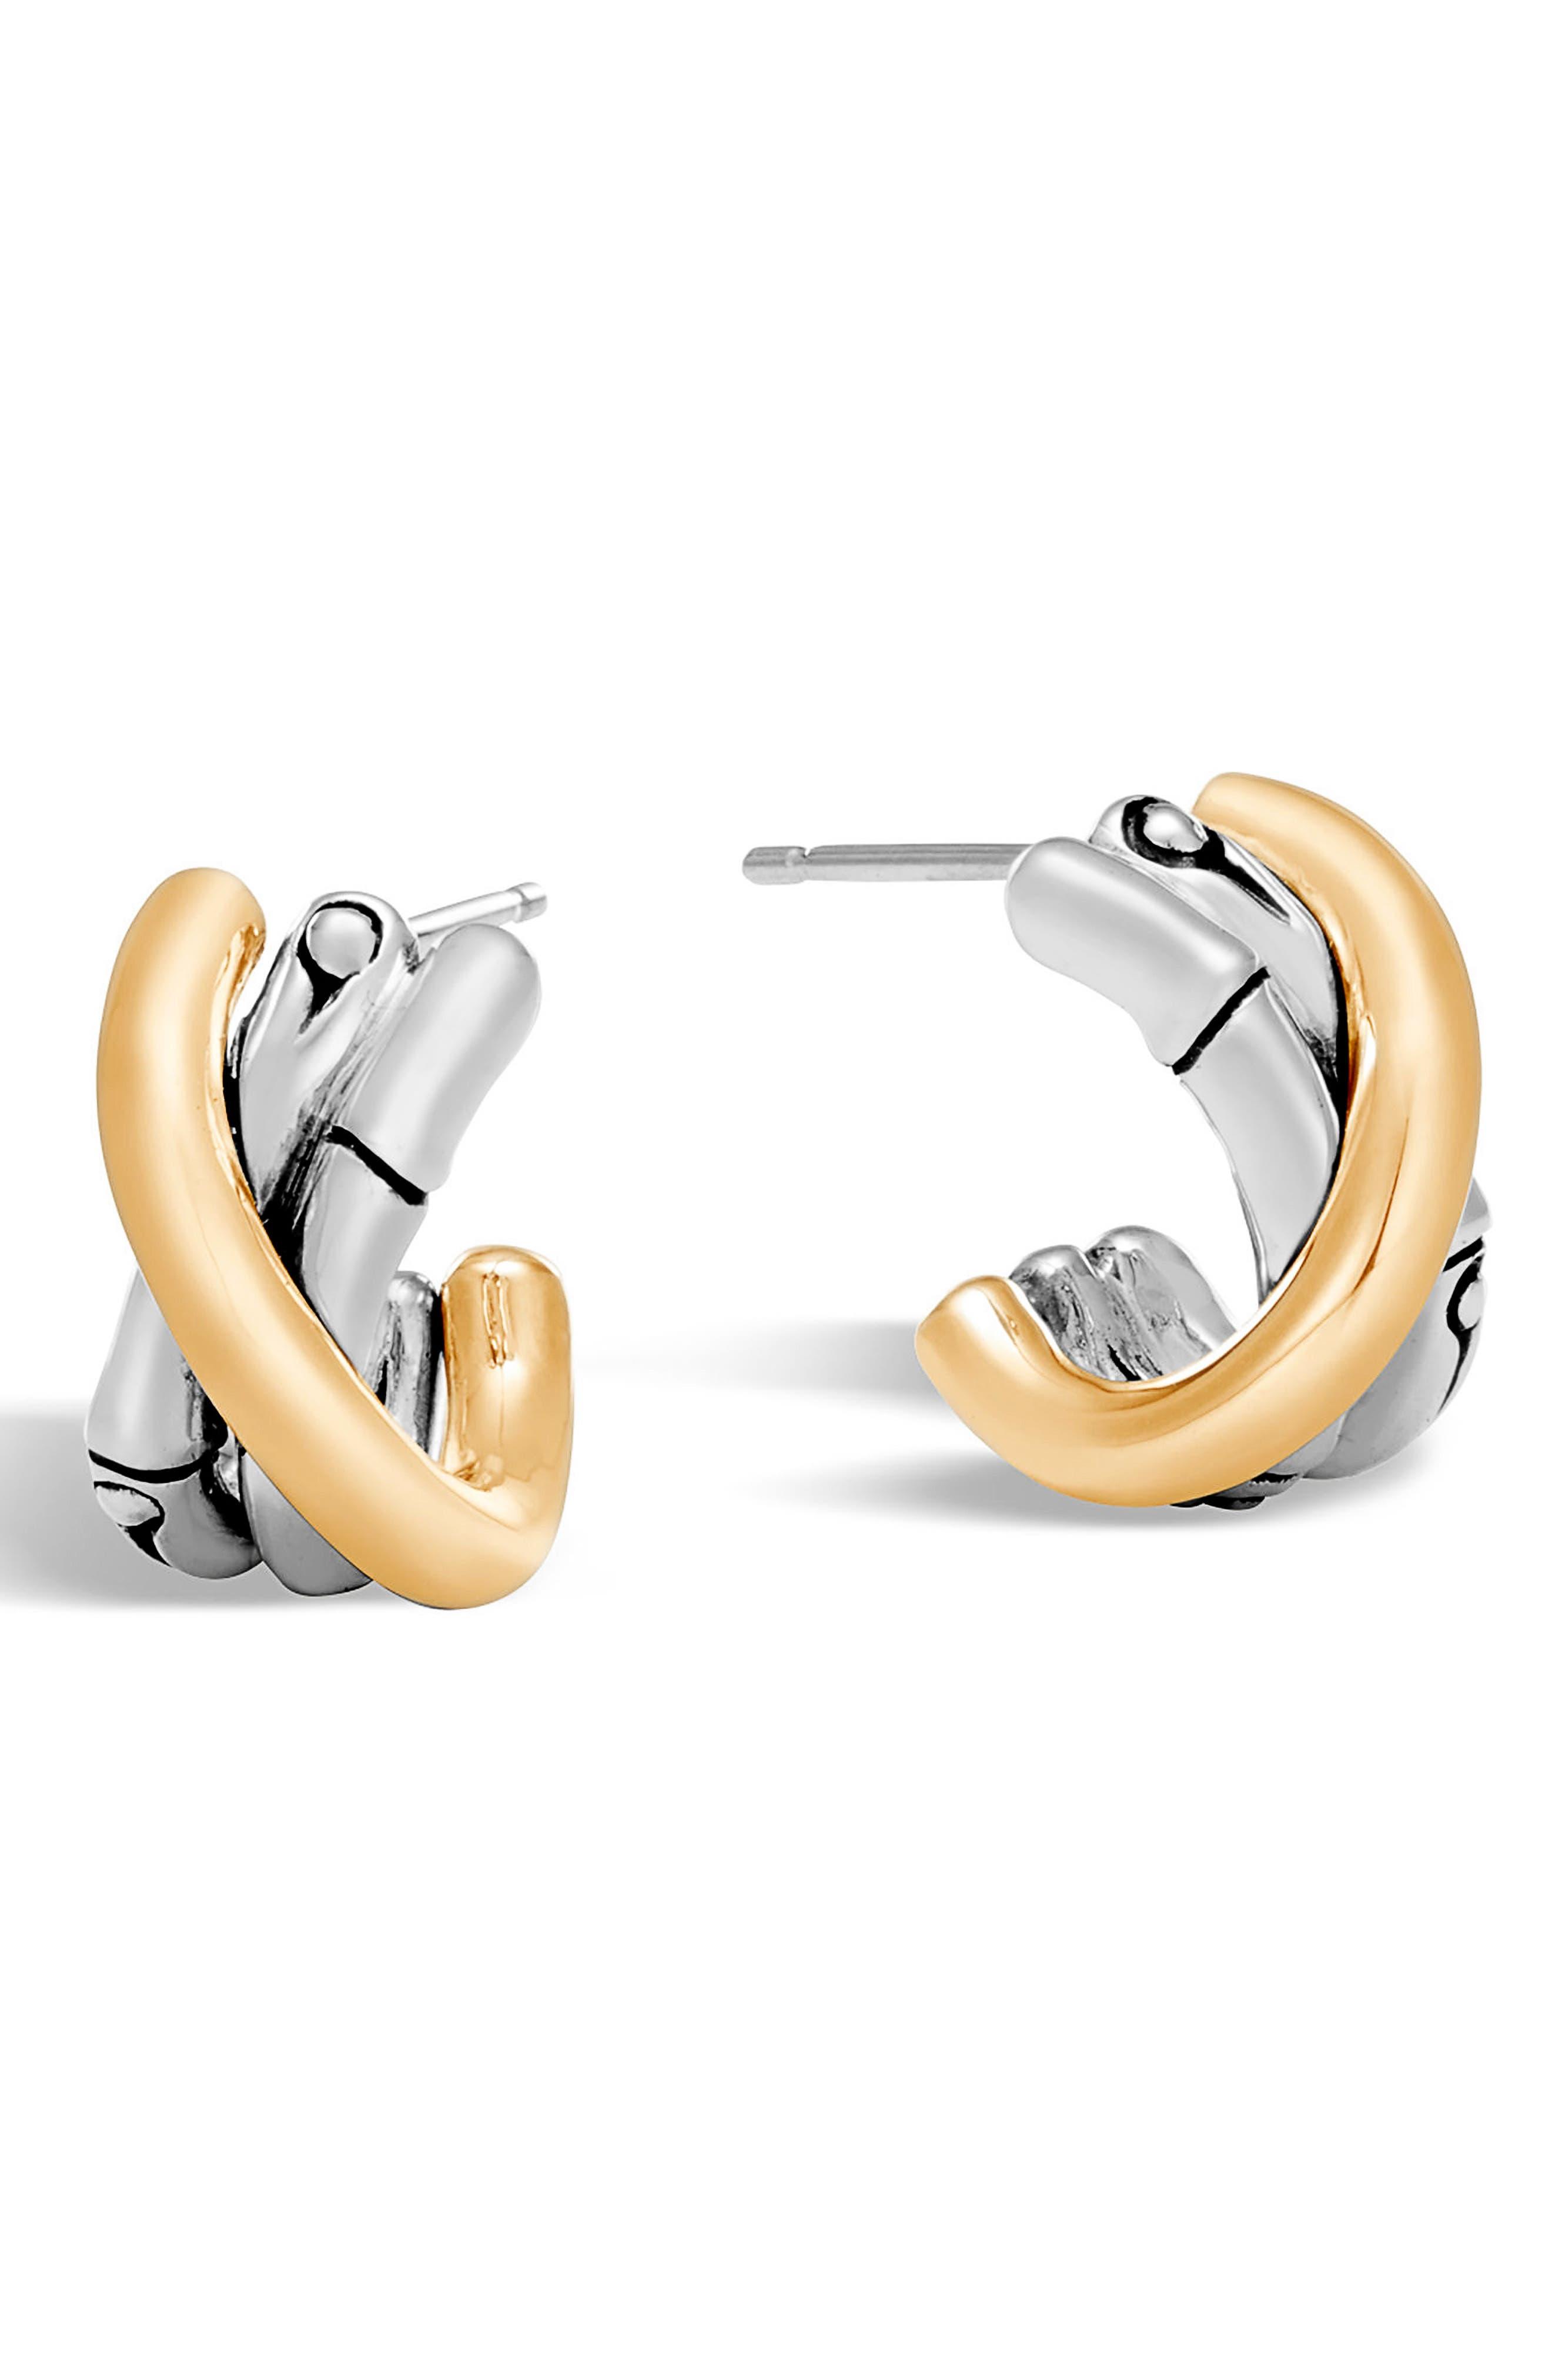 Alternate Image 1 Selected - John Hardy Bamboo Stud Earrings